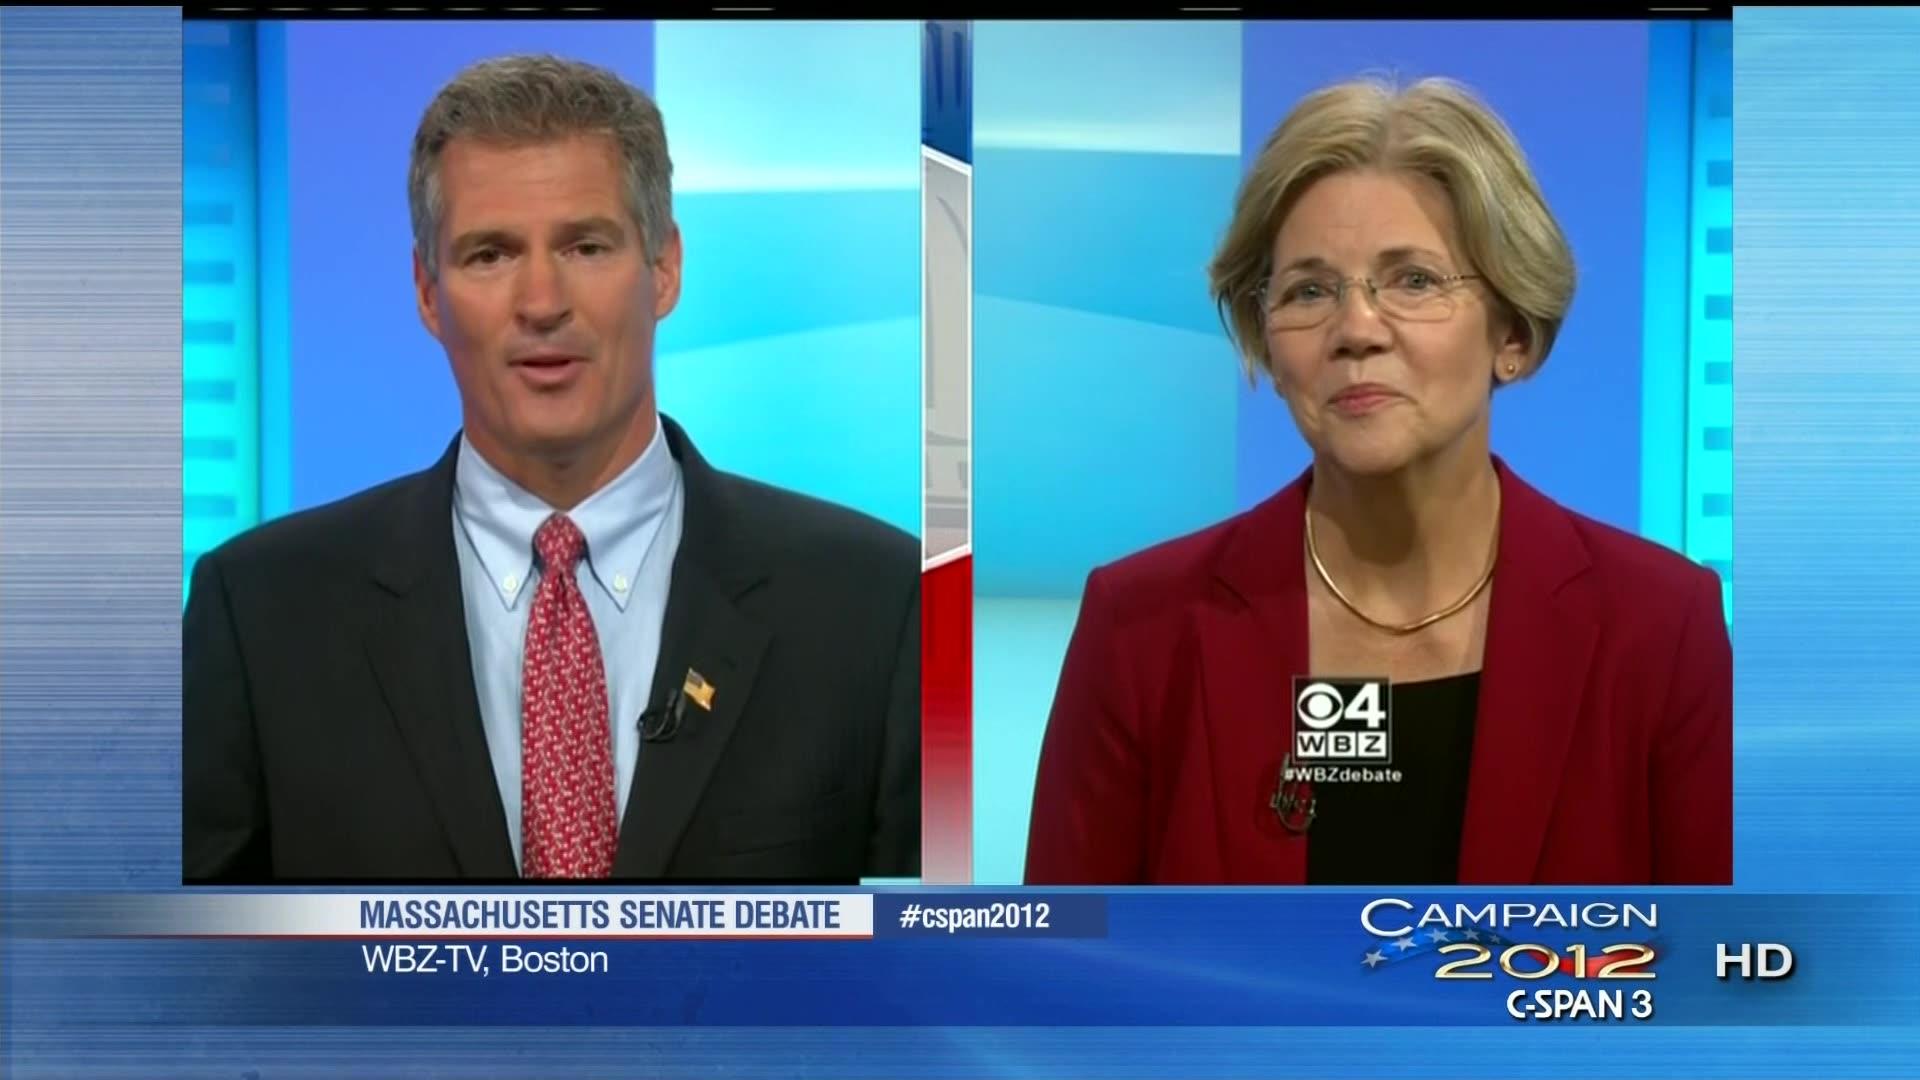 Massachusetts Senate Debate